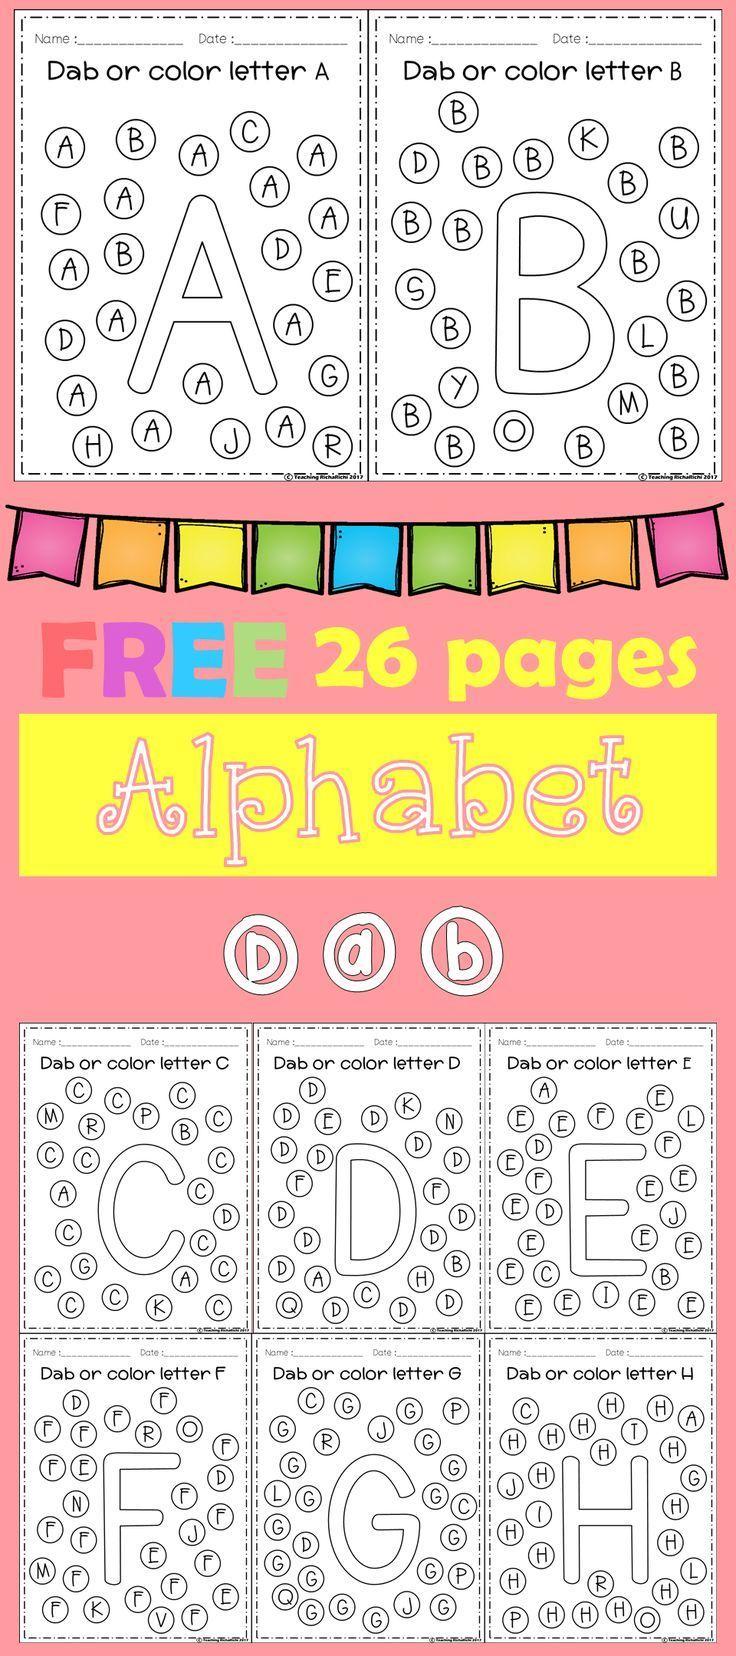 FREE Alphabet Dab (A-Z)   Kindergarten Phonics and P.A.   Pinterest ...